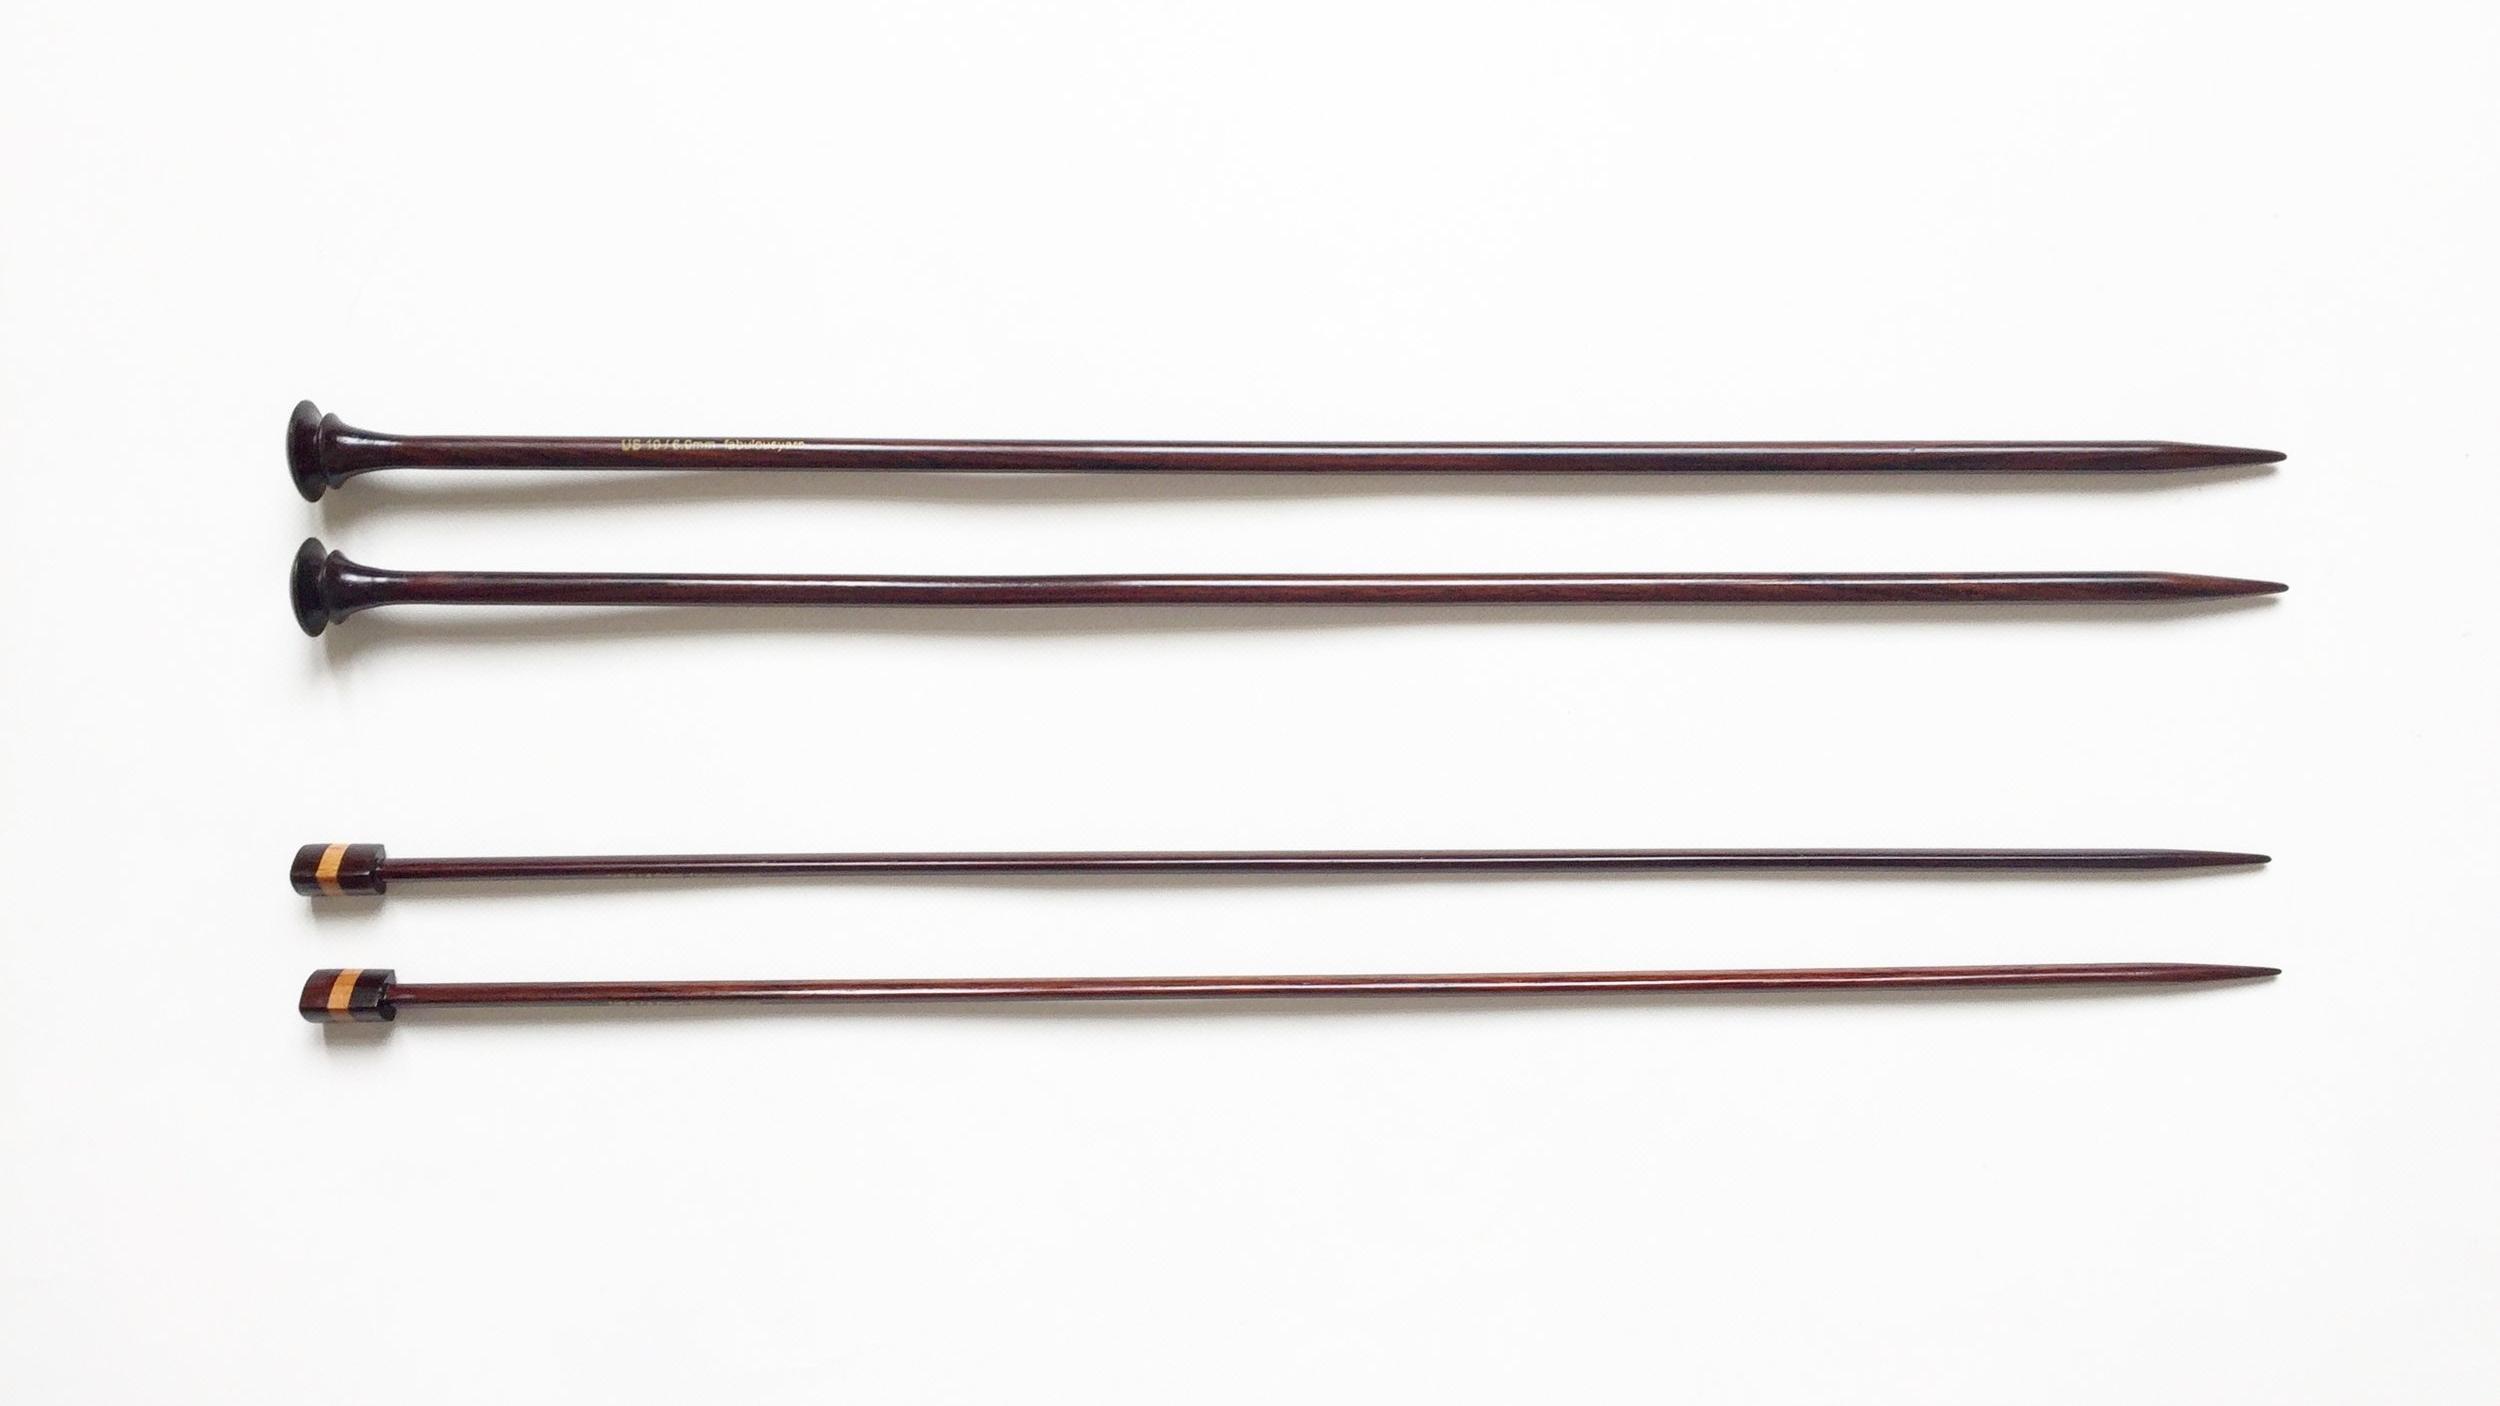 Zen Knitting Needles Review